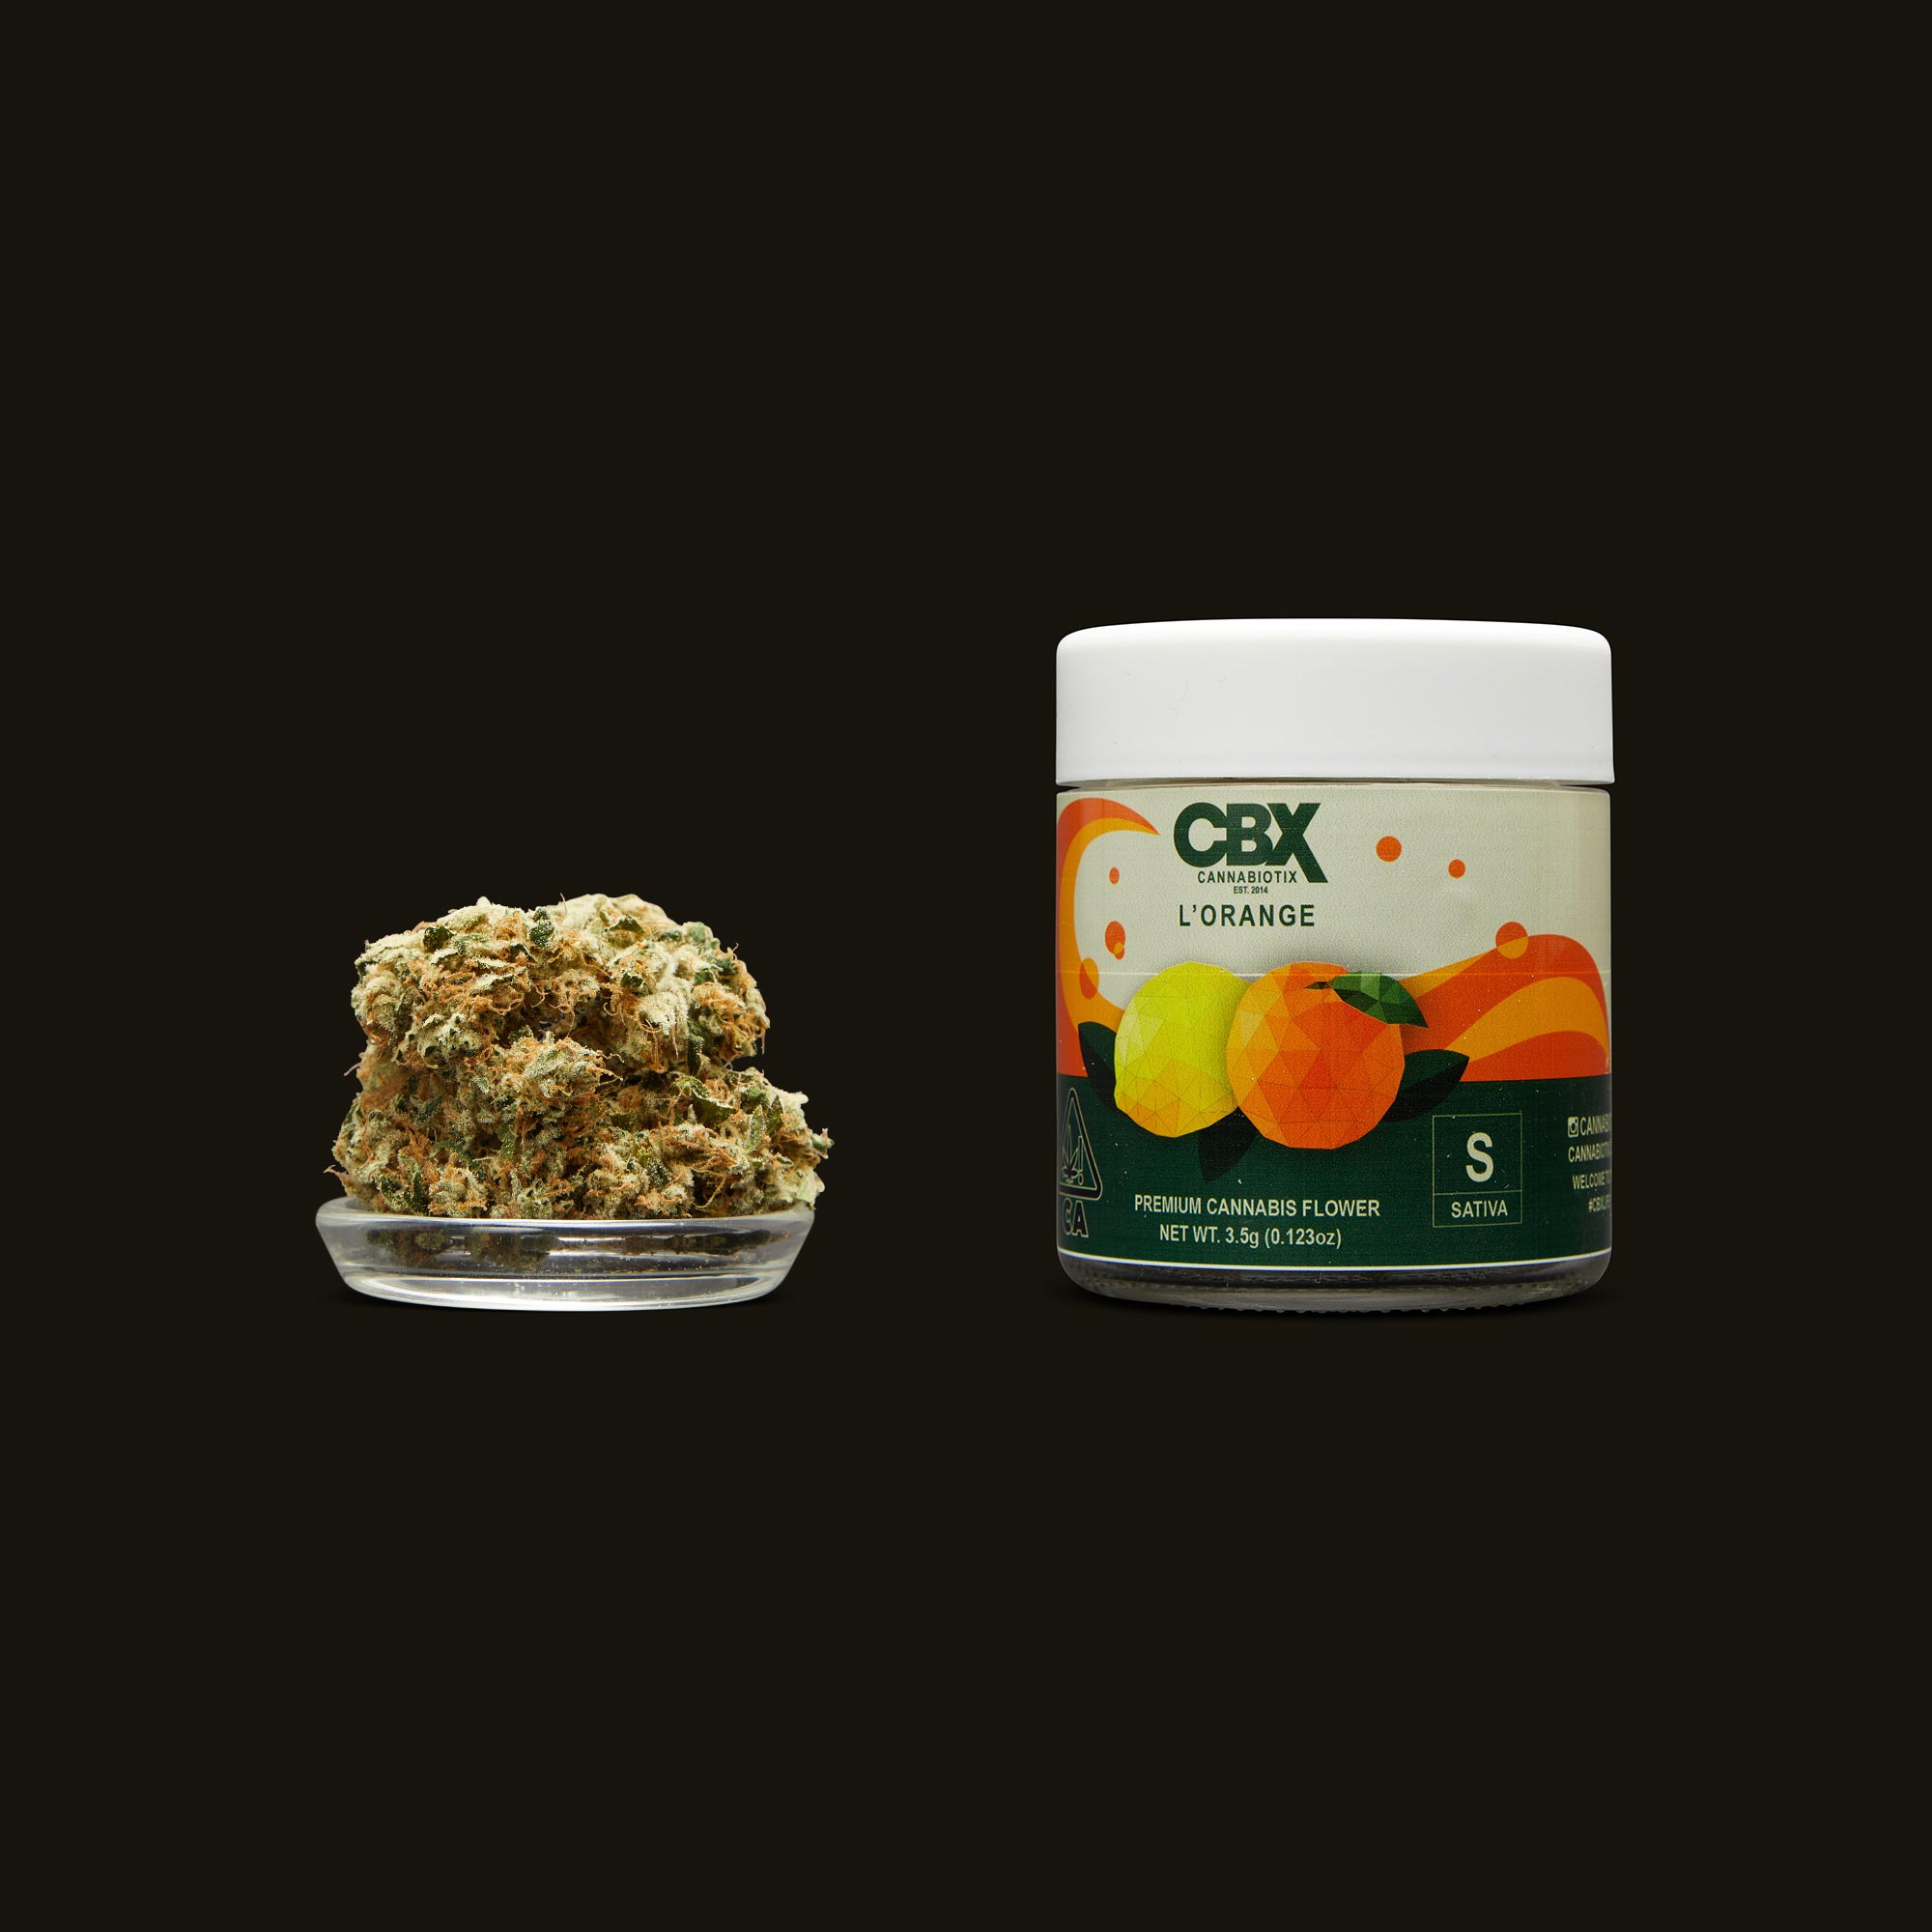 Cannabiotix (CBX) L'Orange